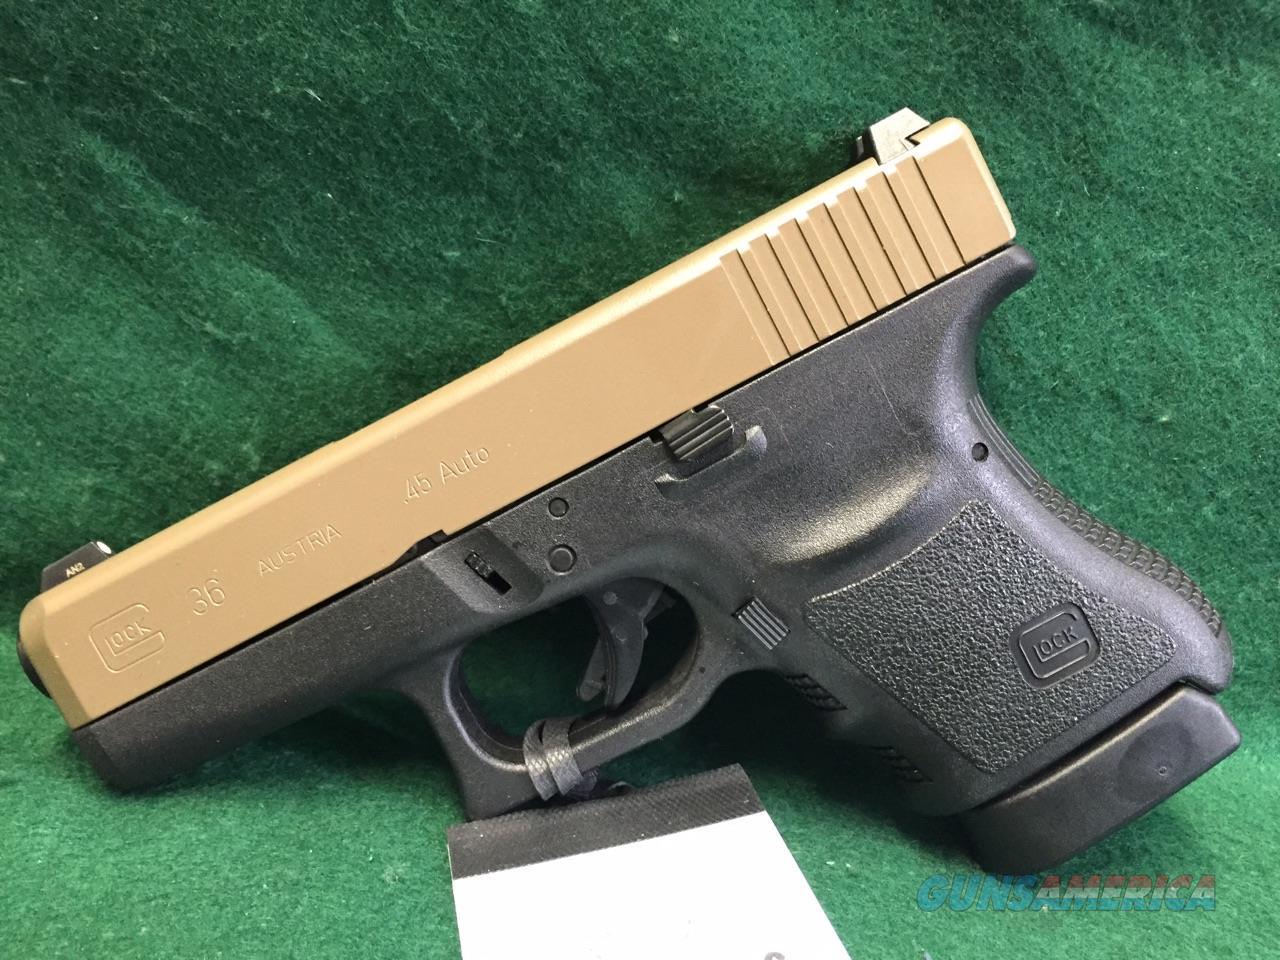 Glock 36 Cerakoted Slide  Guns > Pistols > Glock Pistols > 29/30/36